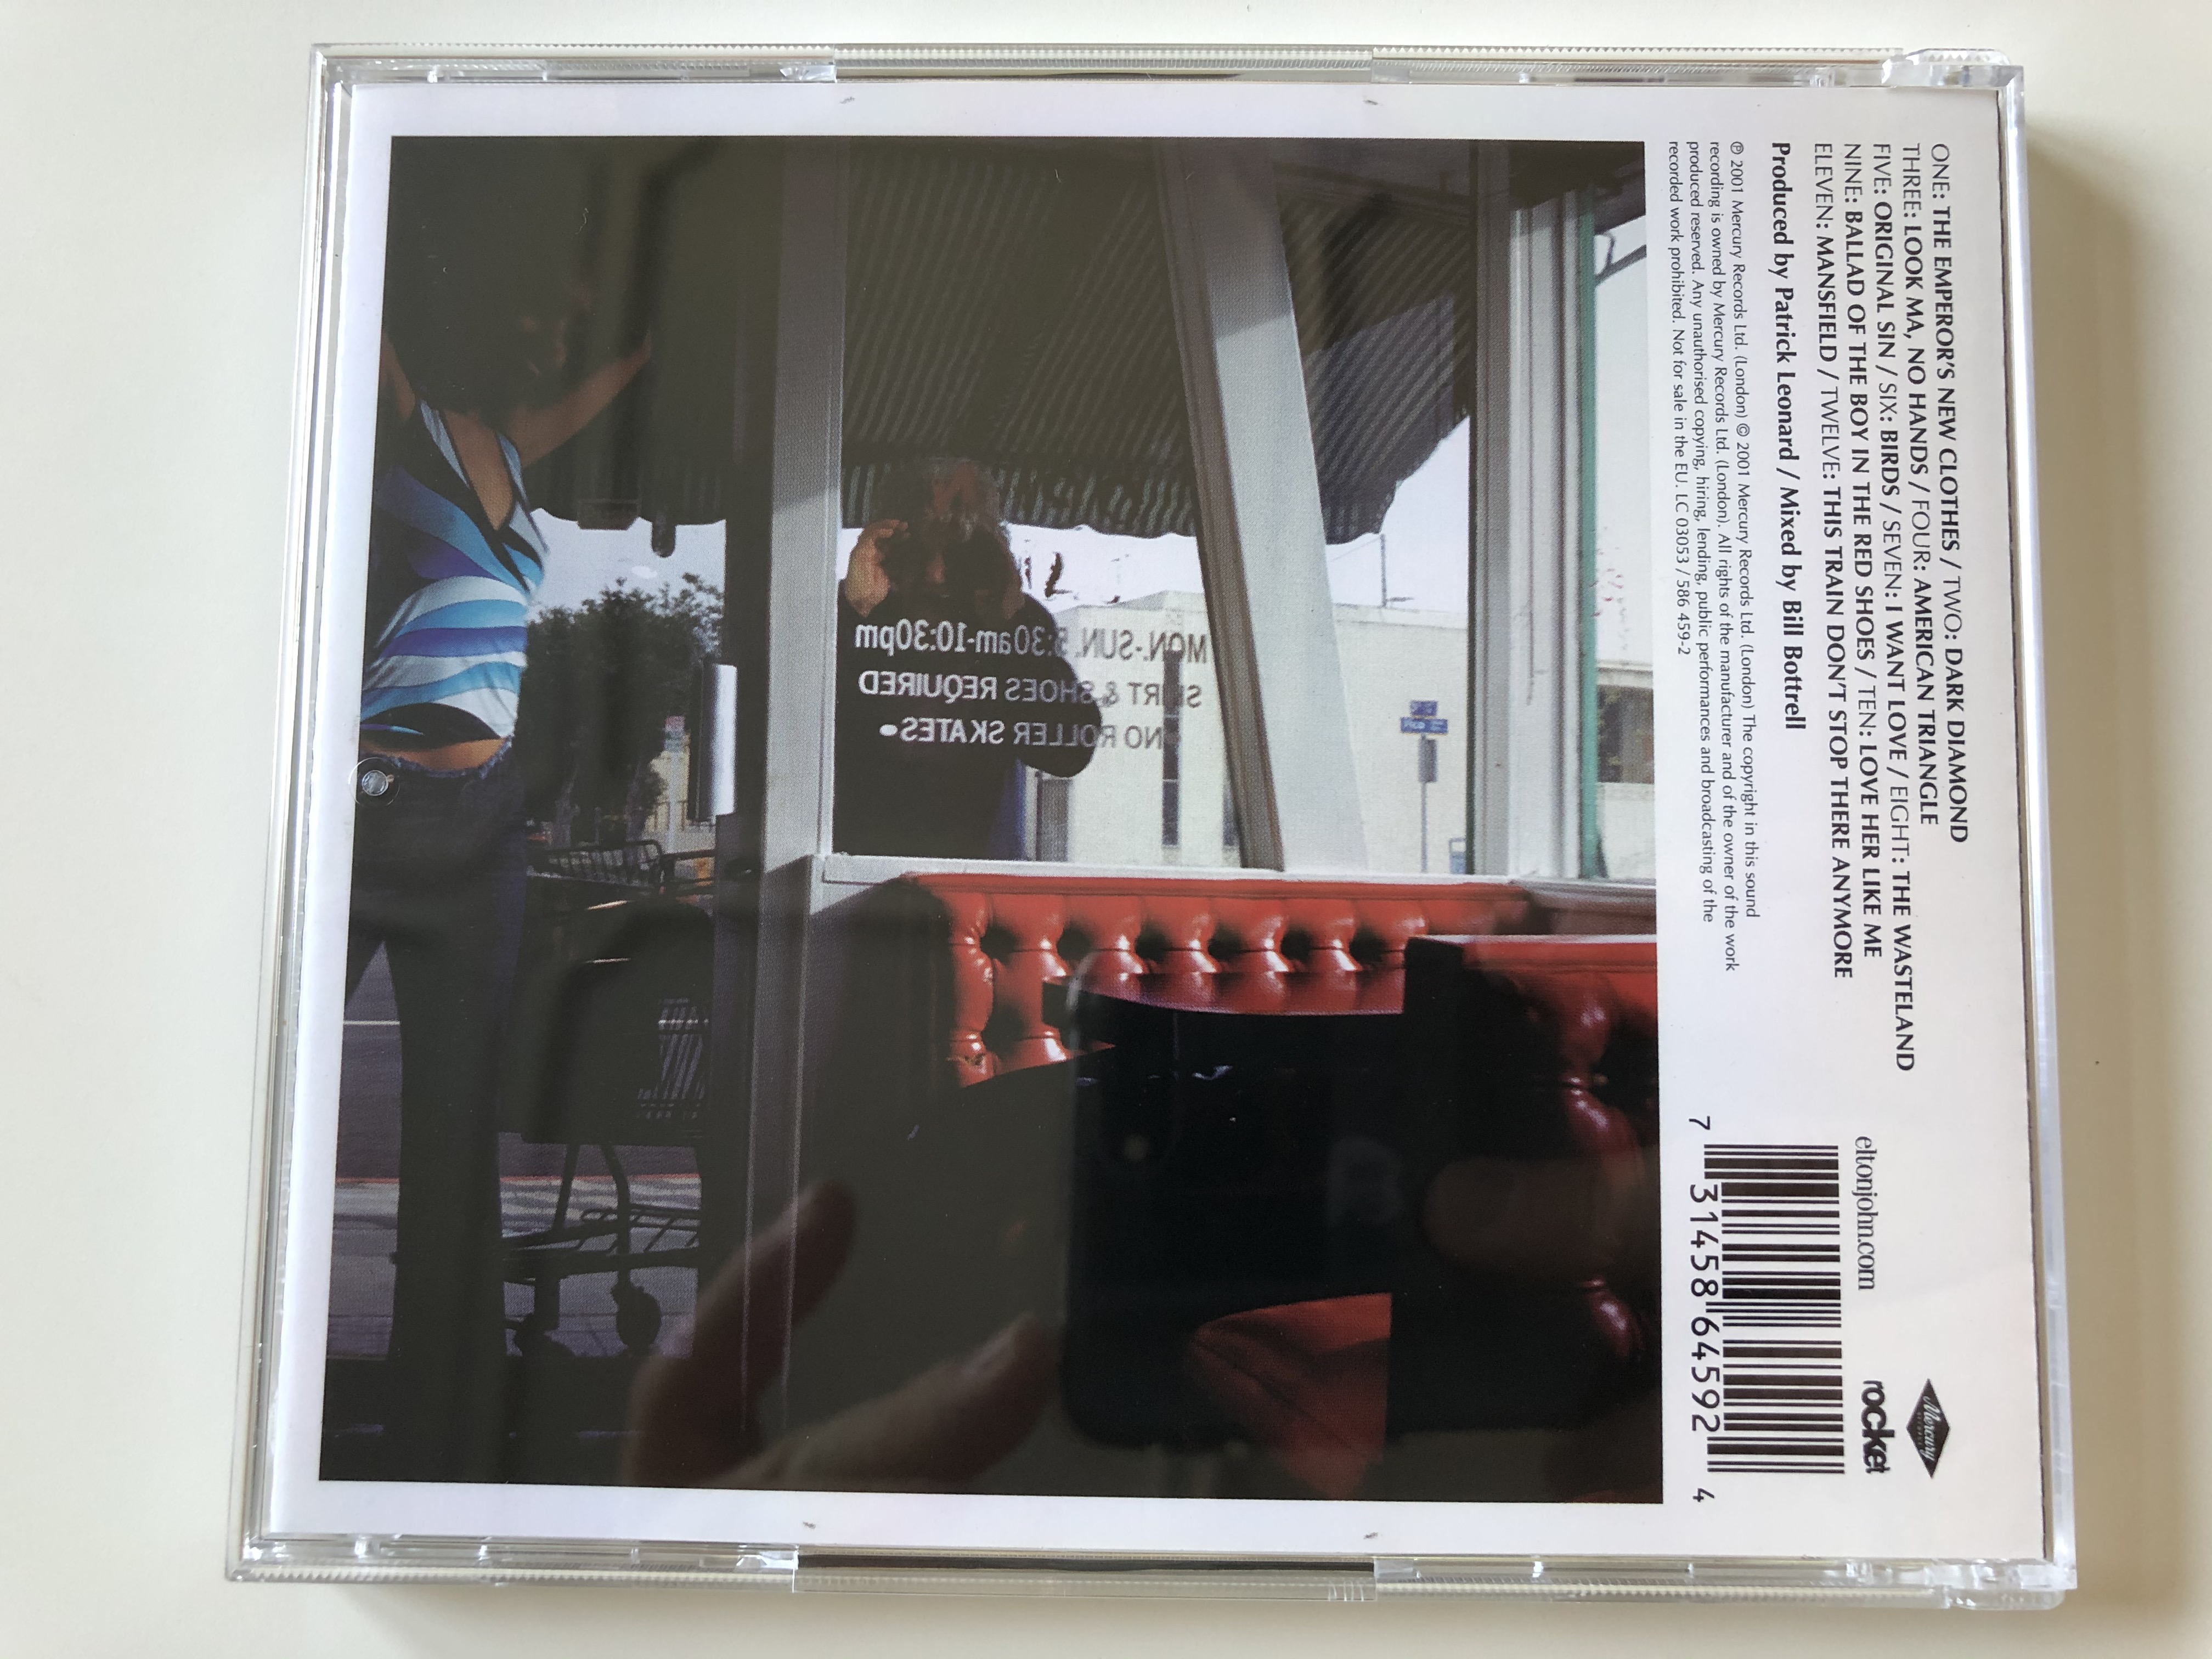 elton-john-songs-from-the-west-coast-mercury-audio-cd-2001-586-459-2-4-.jpg